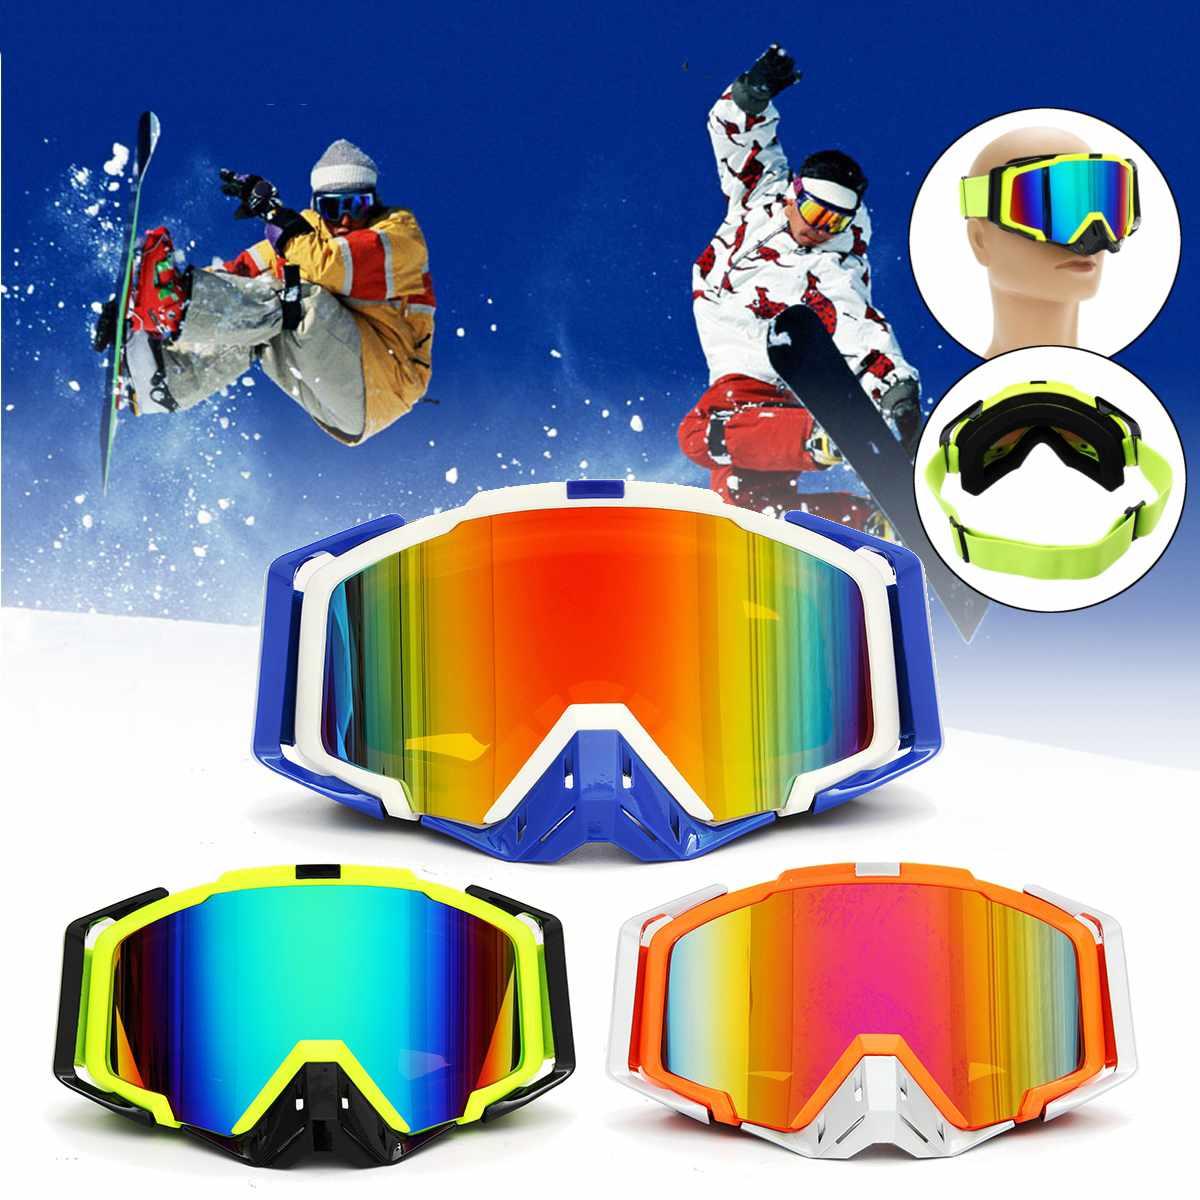 Motocross Motorcycle Goggles ATV Off Road Dirt Bike DustProof Racing Glasses Anti Wind Eyewear Protective Gears Skiing Goggles